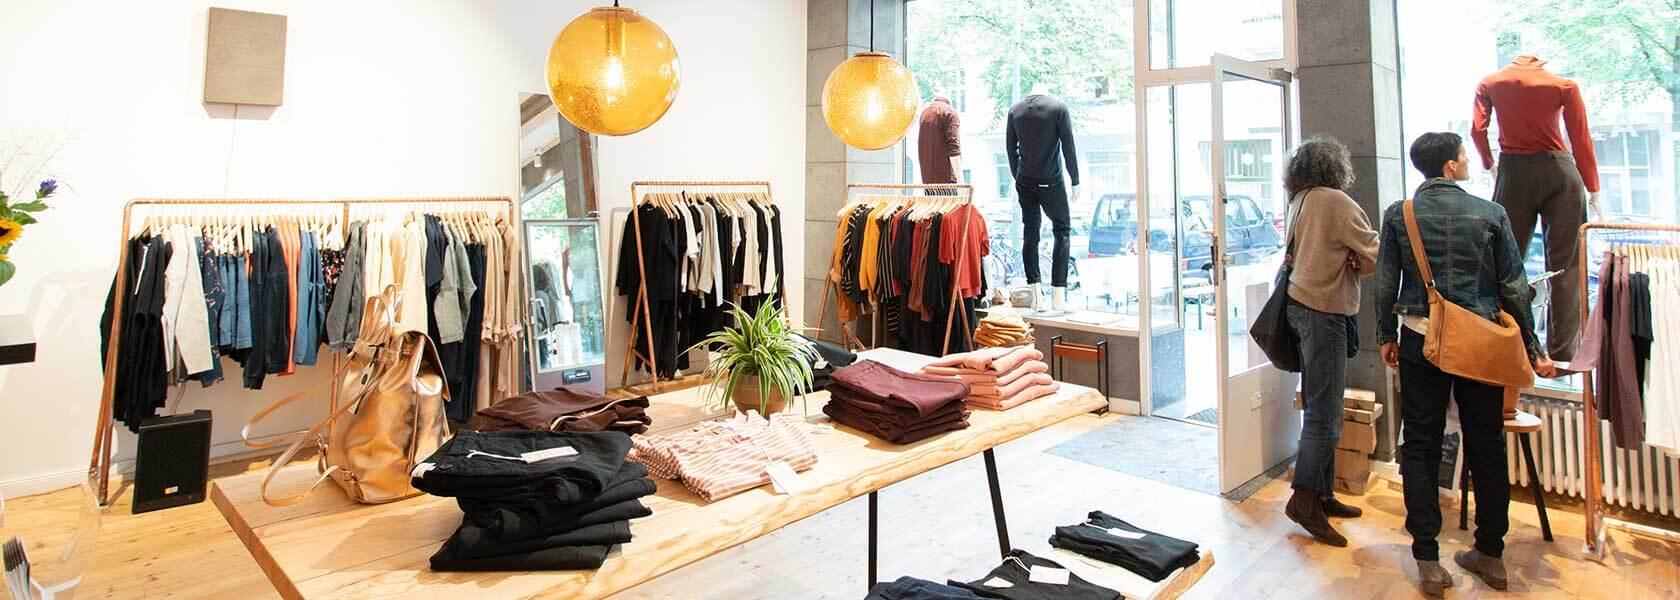 Kunden im LOVECO Store